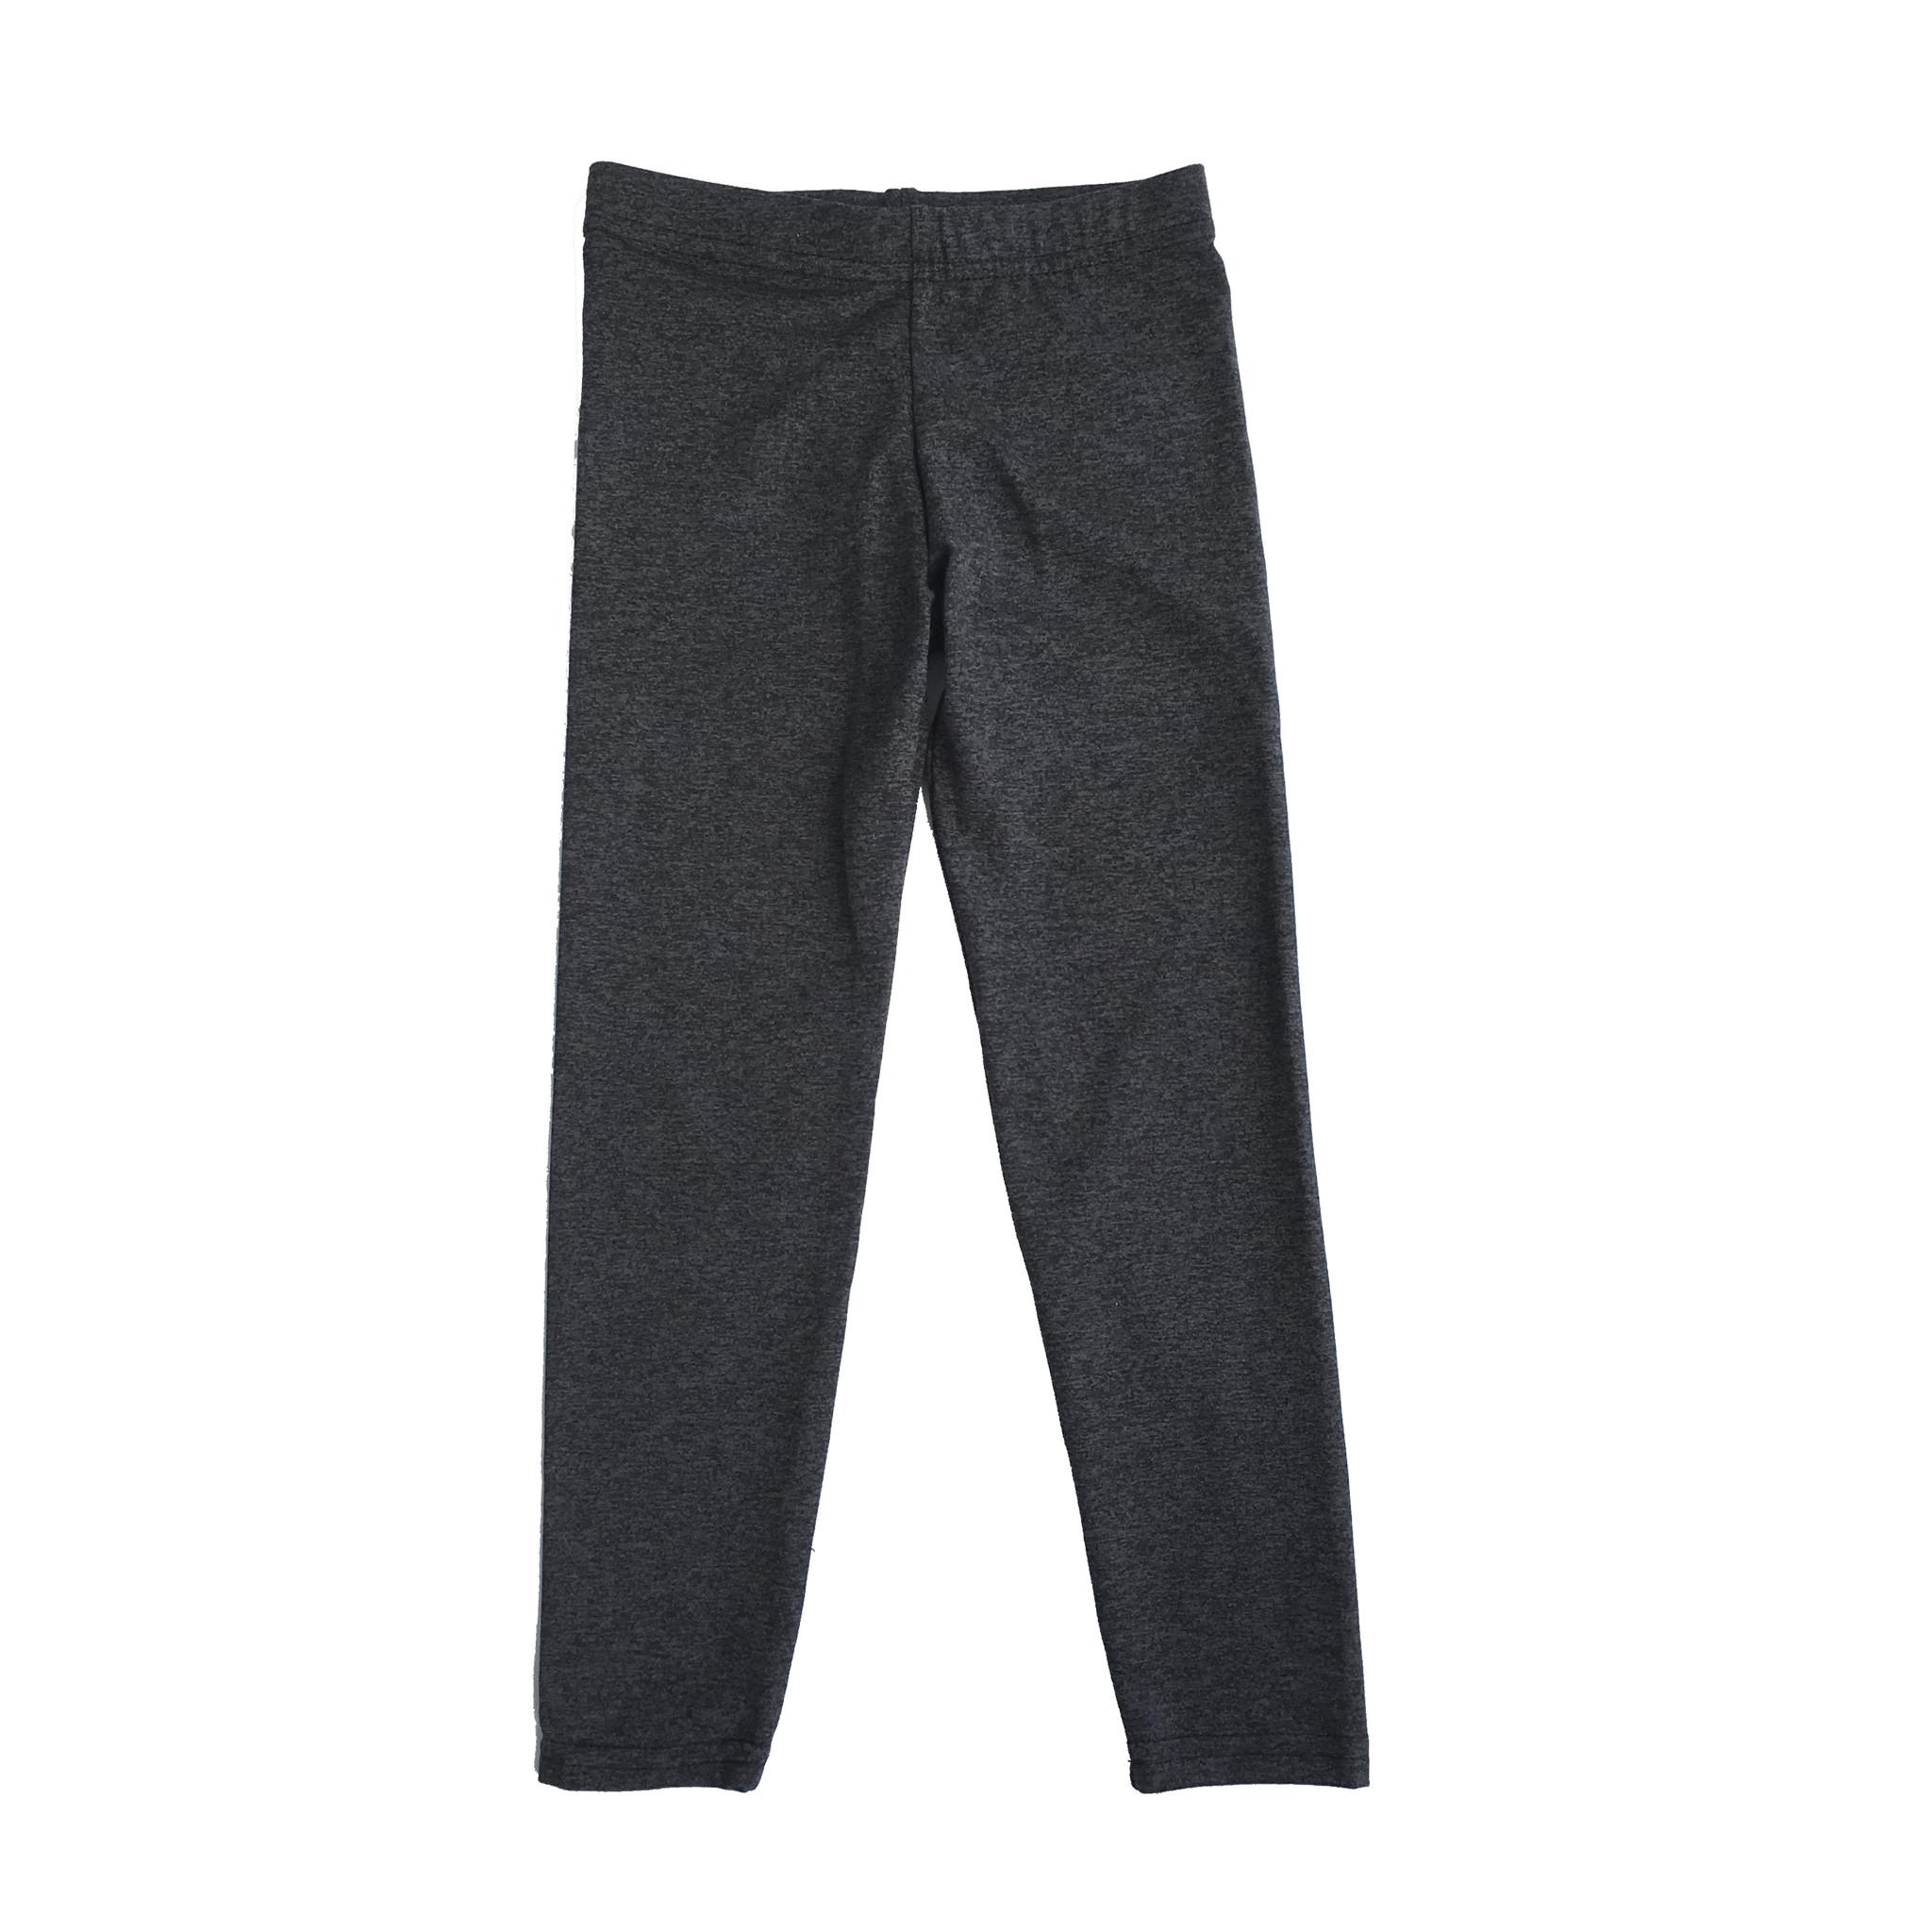 Dori Creations Charcoal/Black Heathered Junior Legging